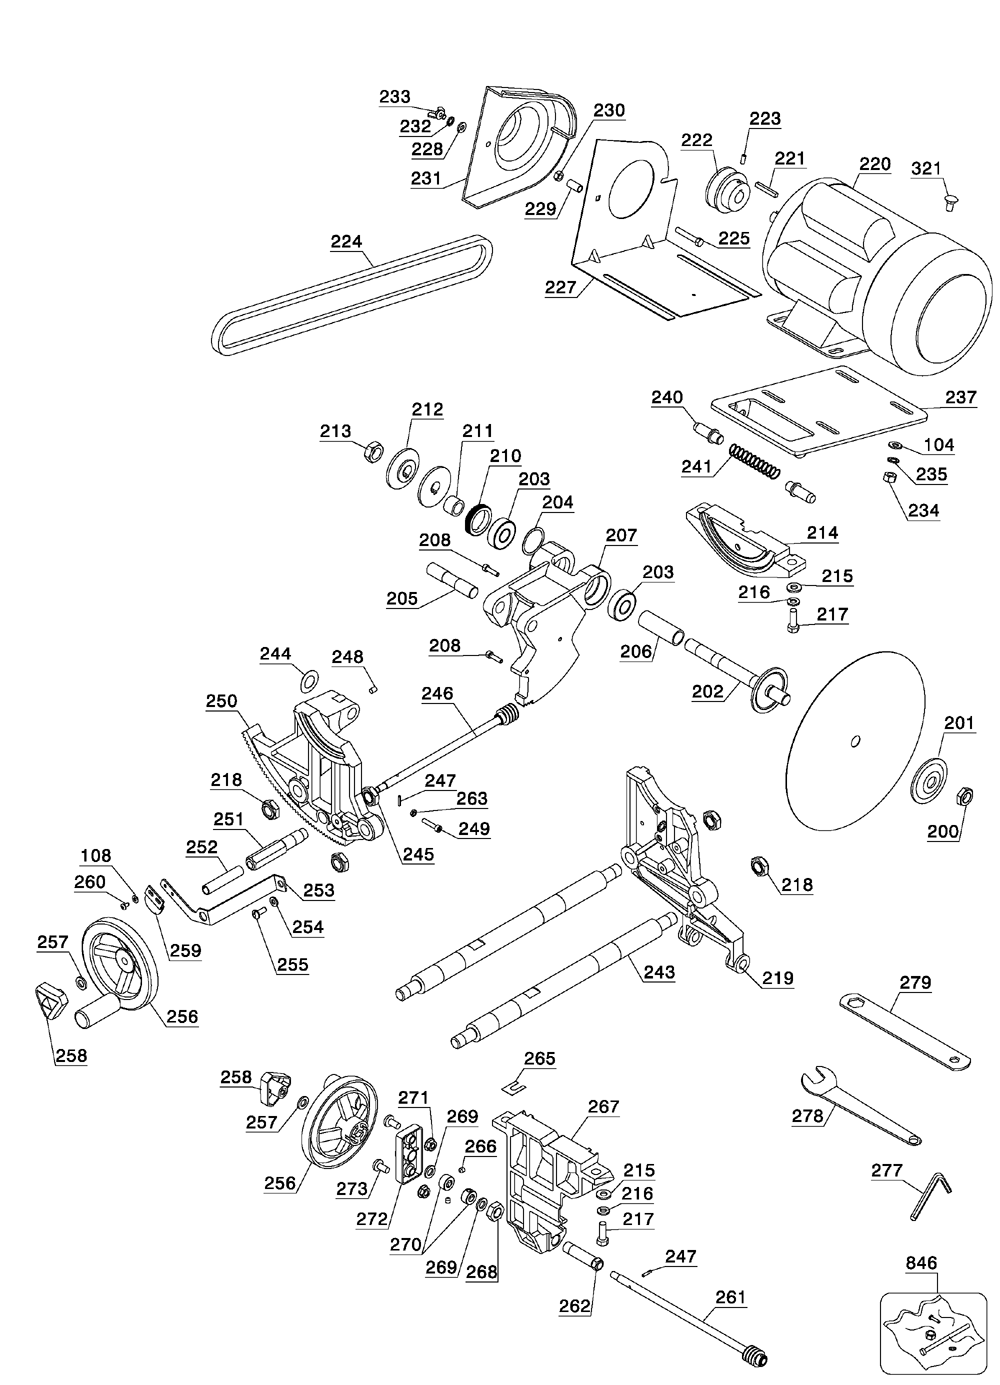 delta saw 28 640 wiring diagram